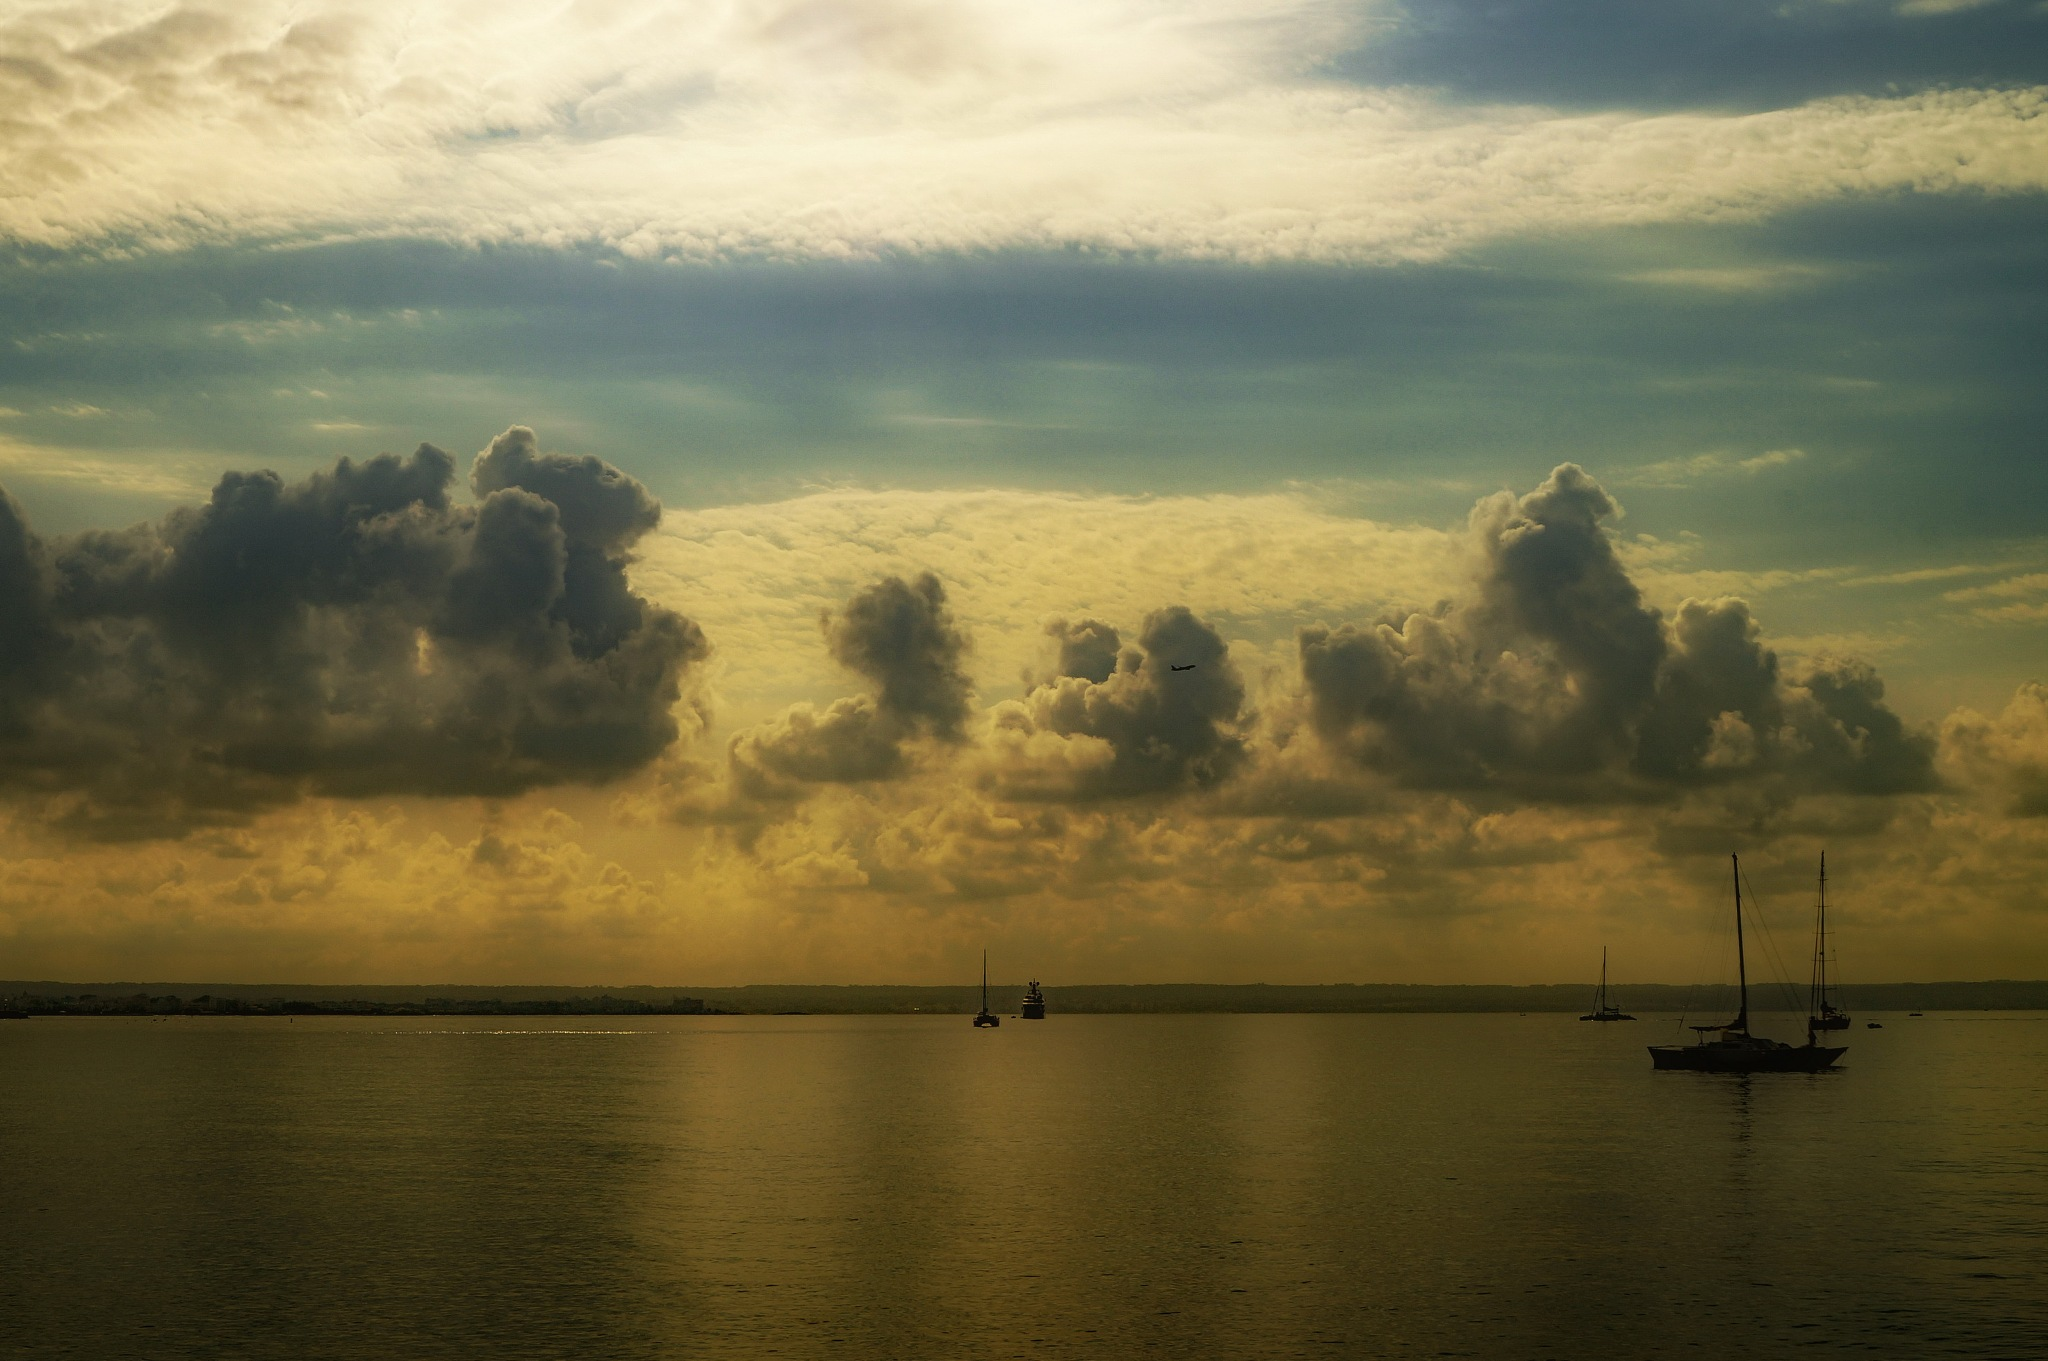 cruise on the Mediterranean by Frank Schmidt